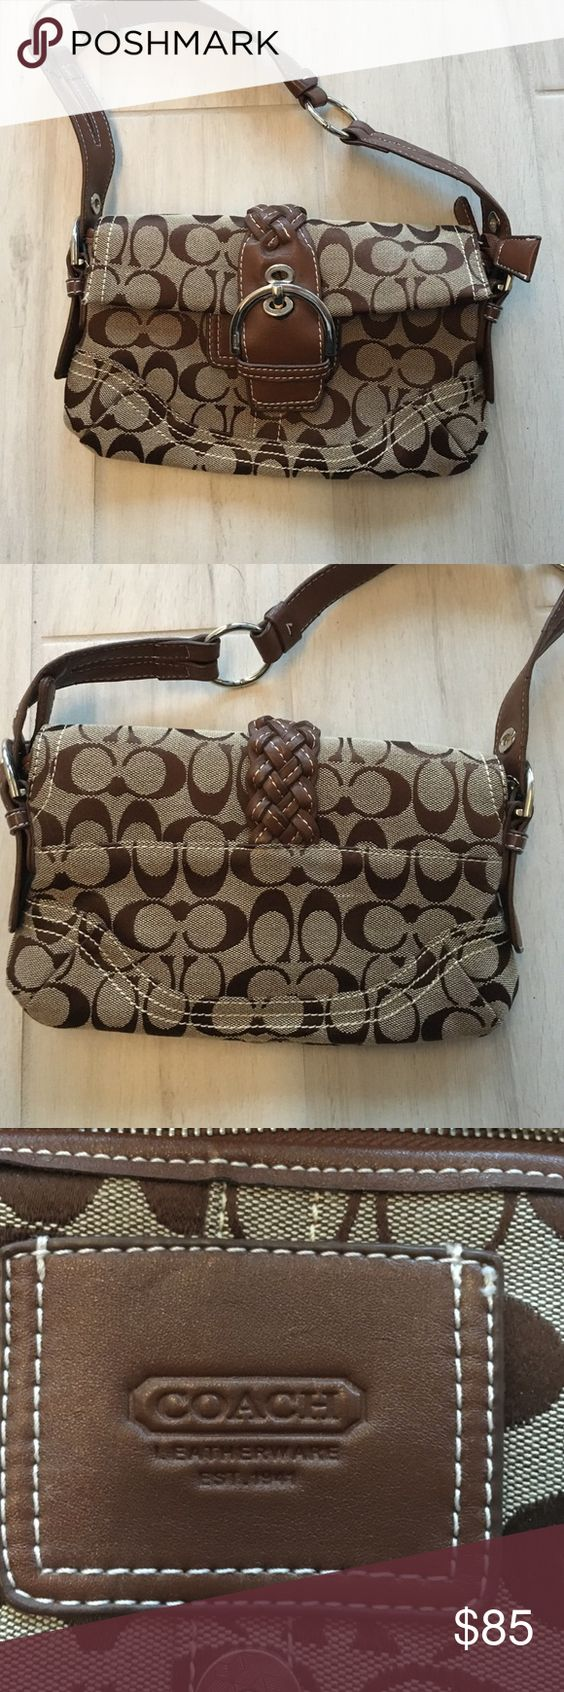 Brown COACH handbag 👜 Never used ⭐️ Brown COACH handbag! Coach Bags